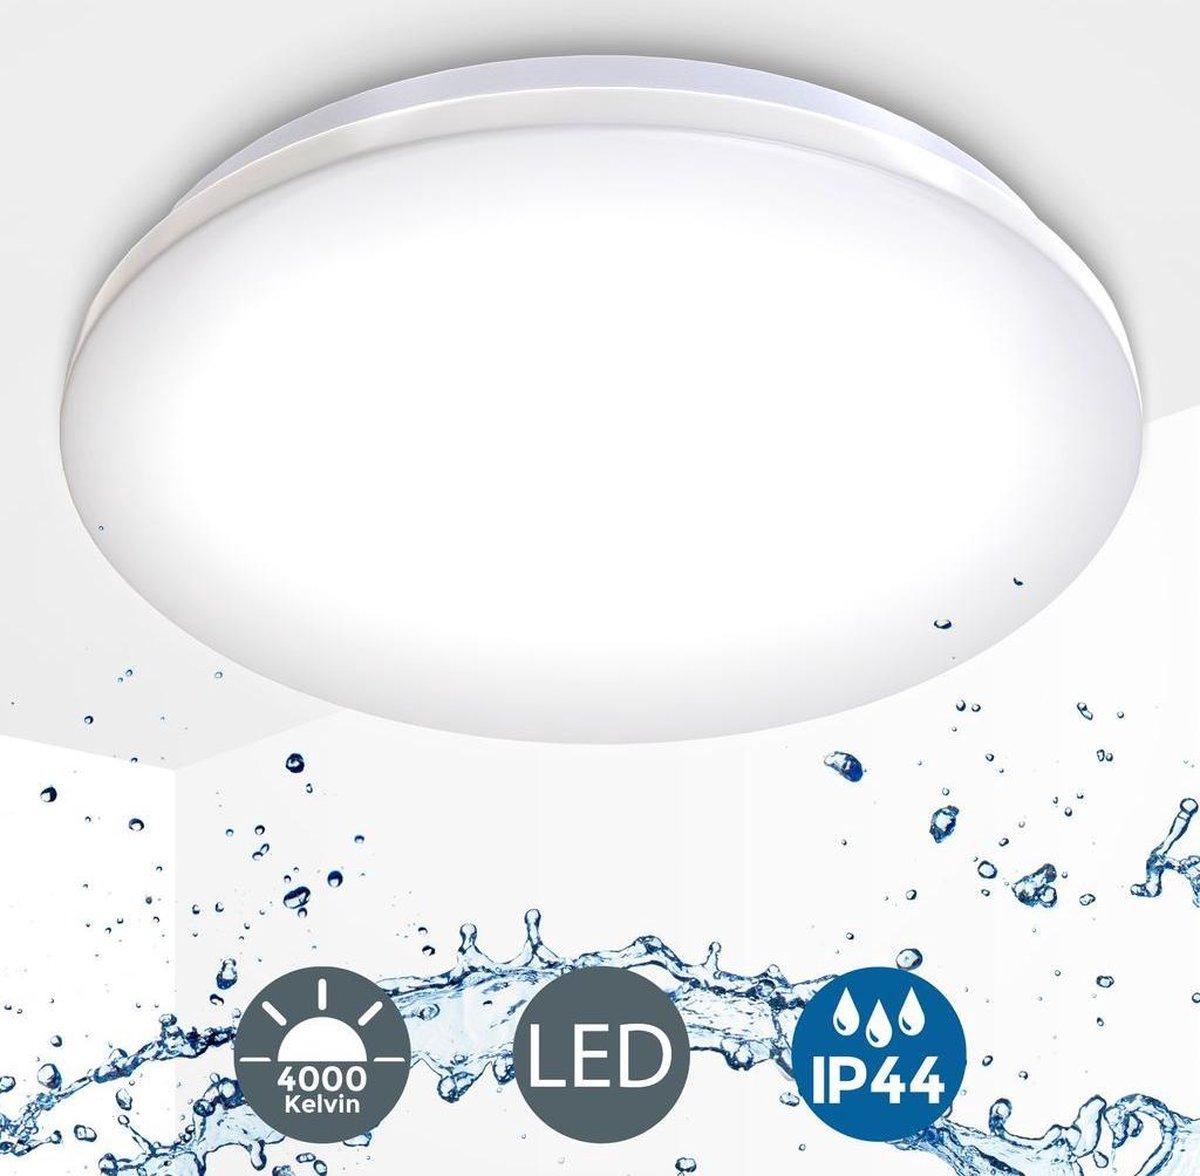 B.K.Licht - Plafondlamp - badkamer - plafoni re - IP44 - wit -  29cm - 4.000K - 1.200Lm - 12W LED